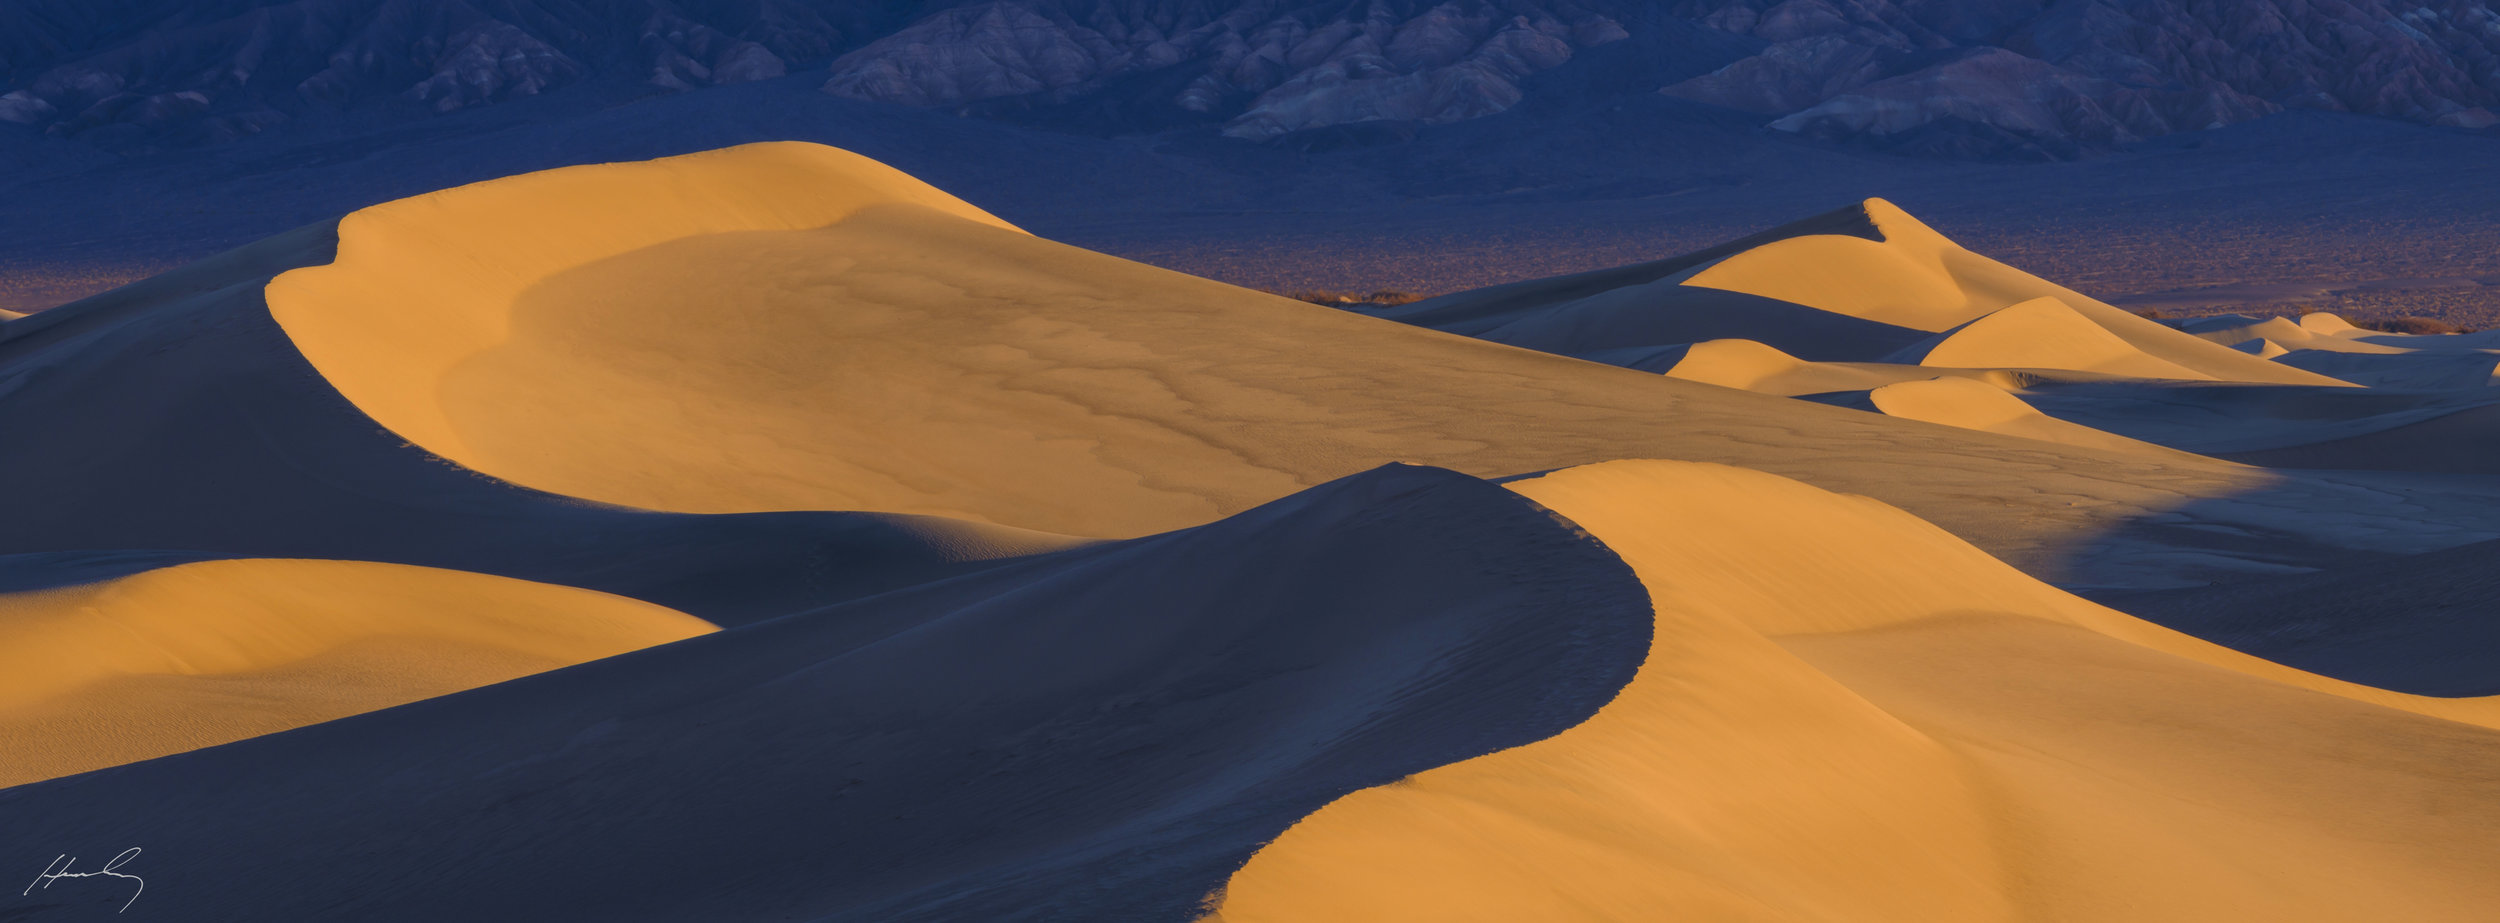 """Mesquite Dunes at Dawn"" Death Valley N.P., California"